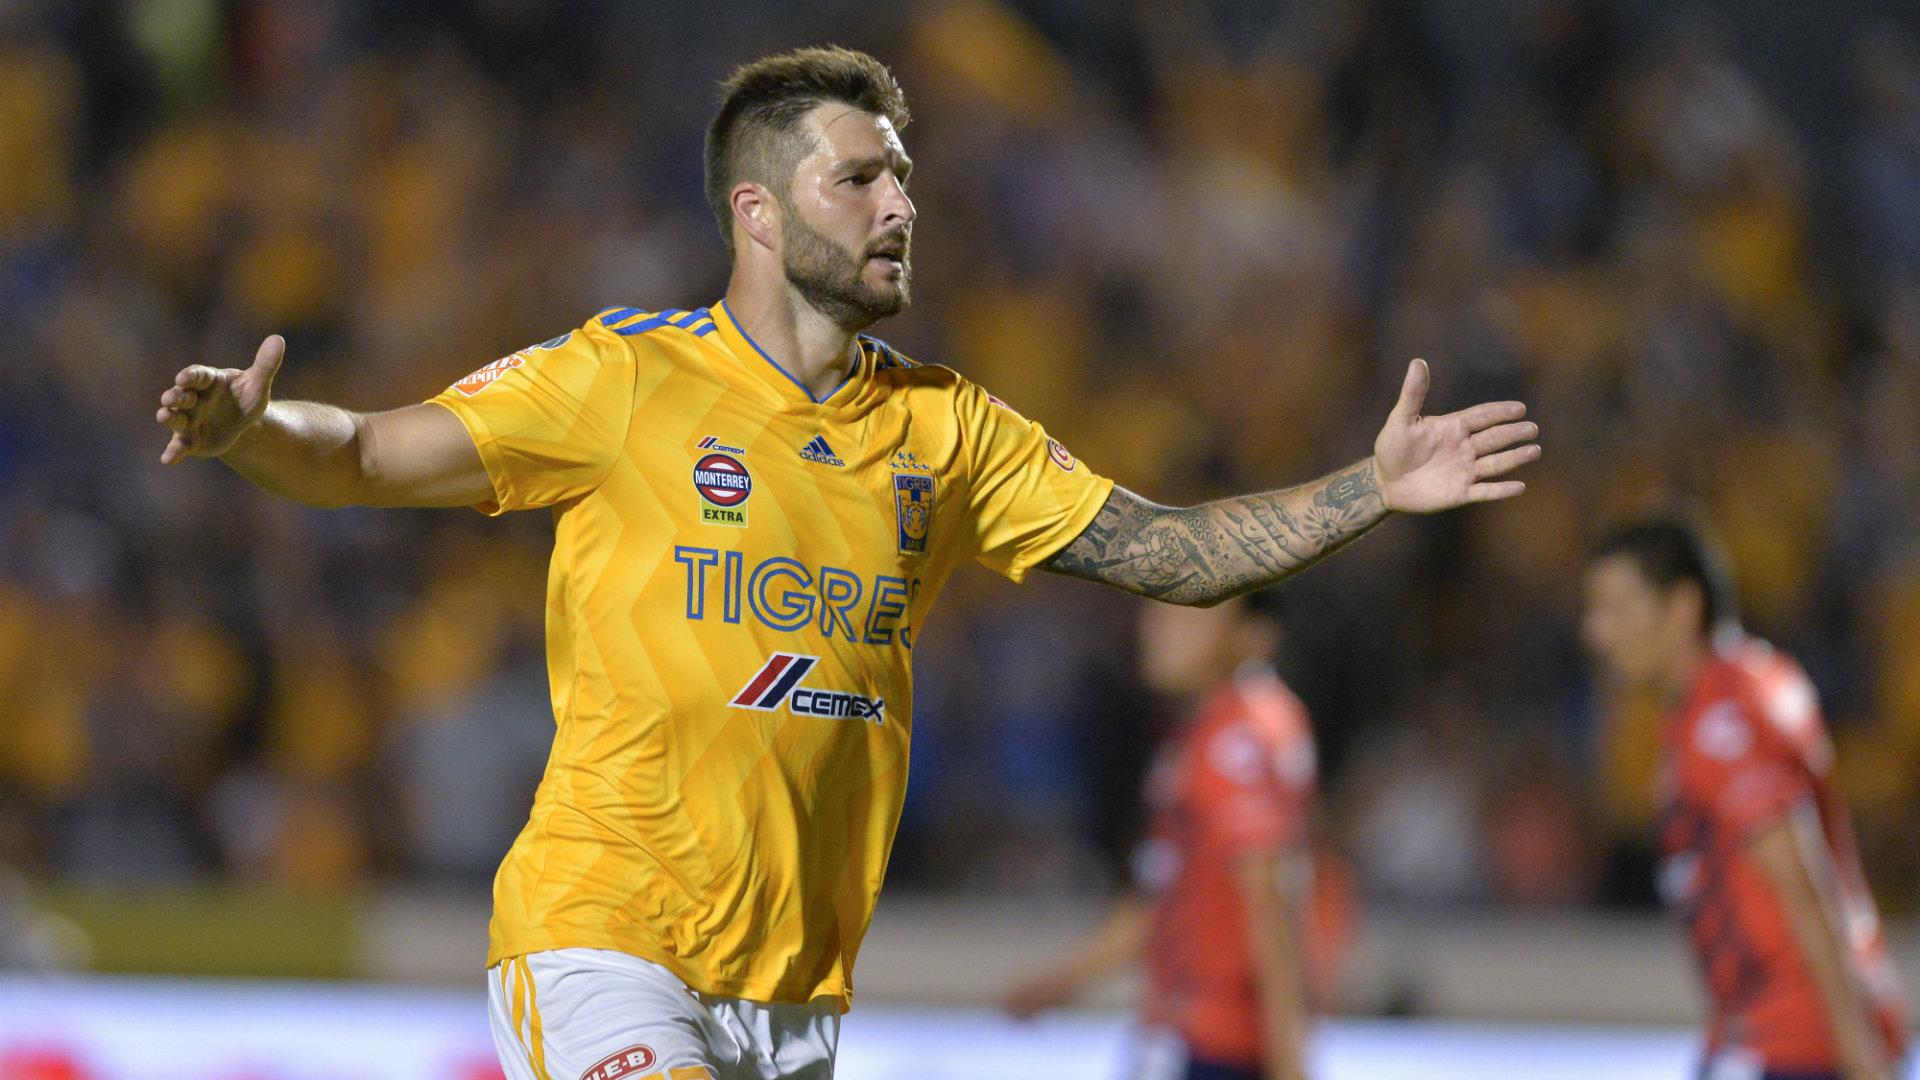 Gignac Tigres Liga MX Apertura 2018a